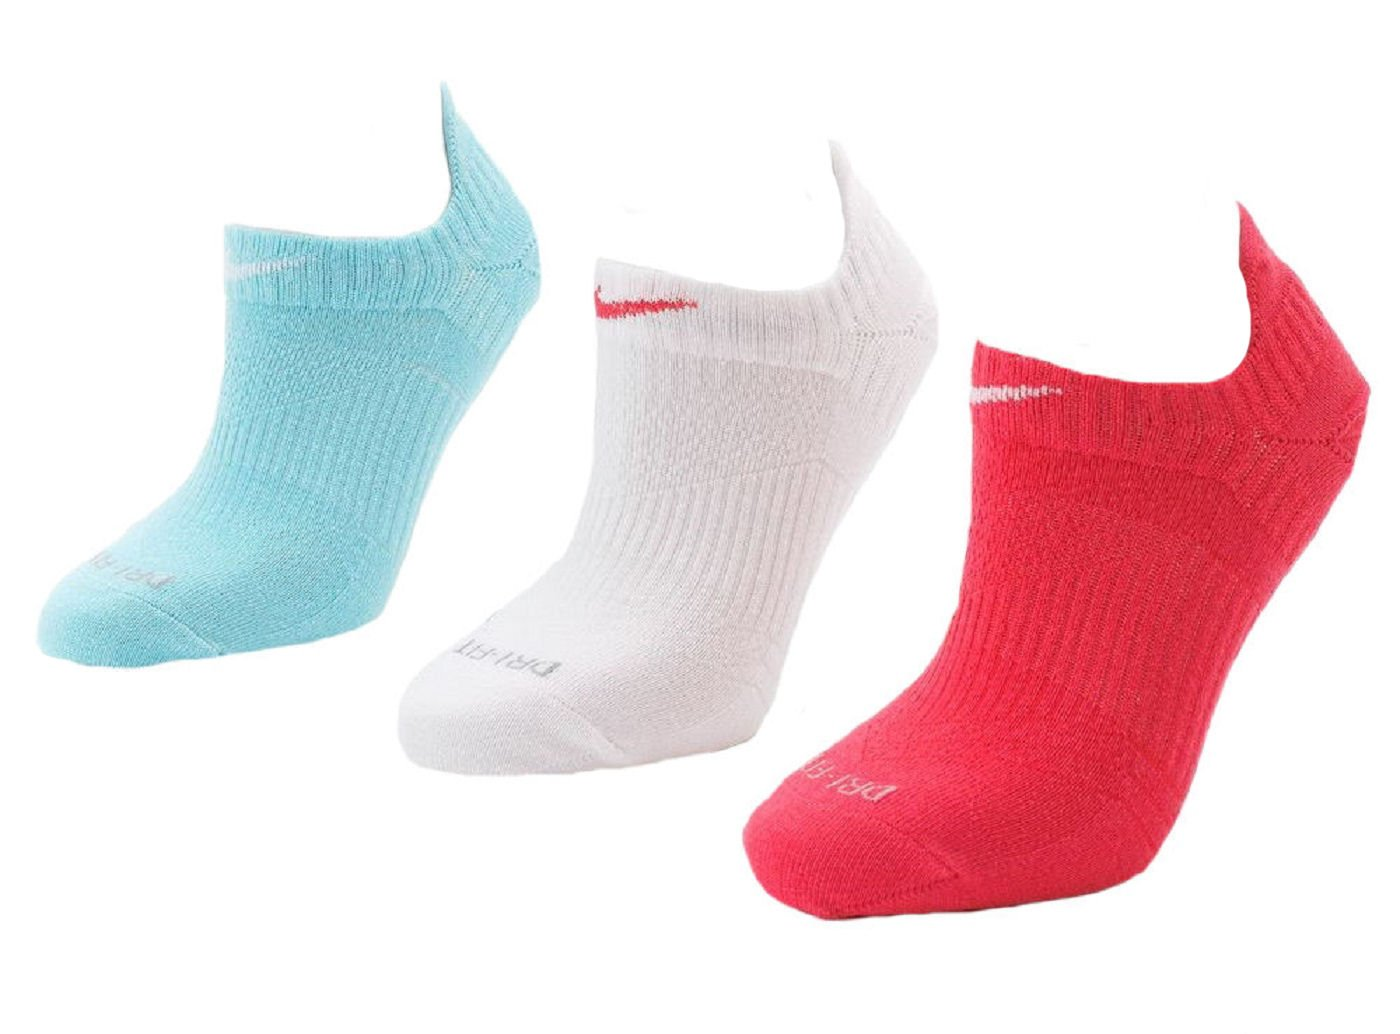 Nike Women's Dri-fit Lightweight No Show Socks 3 Pair